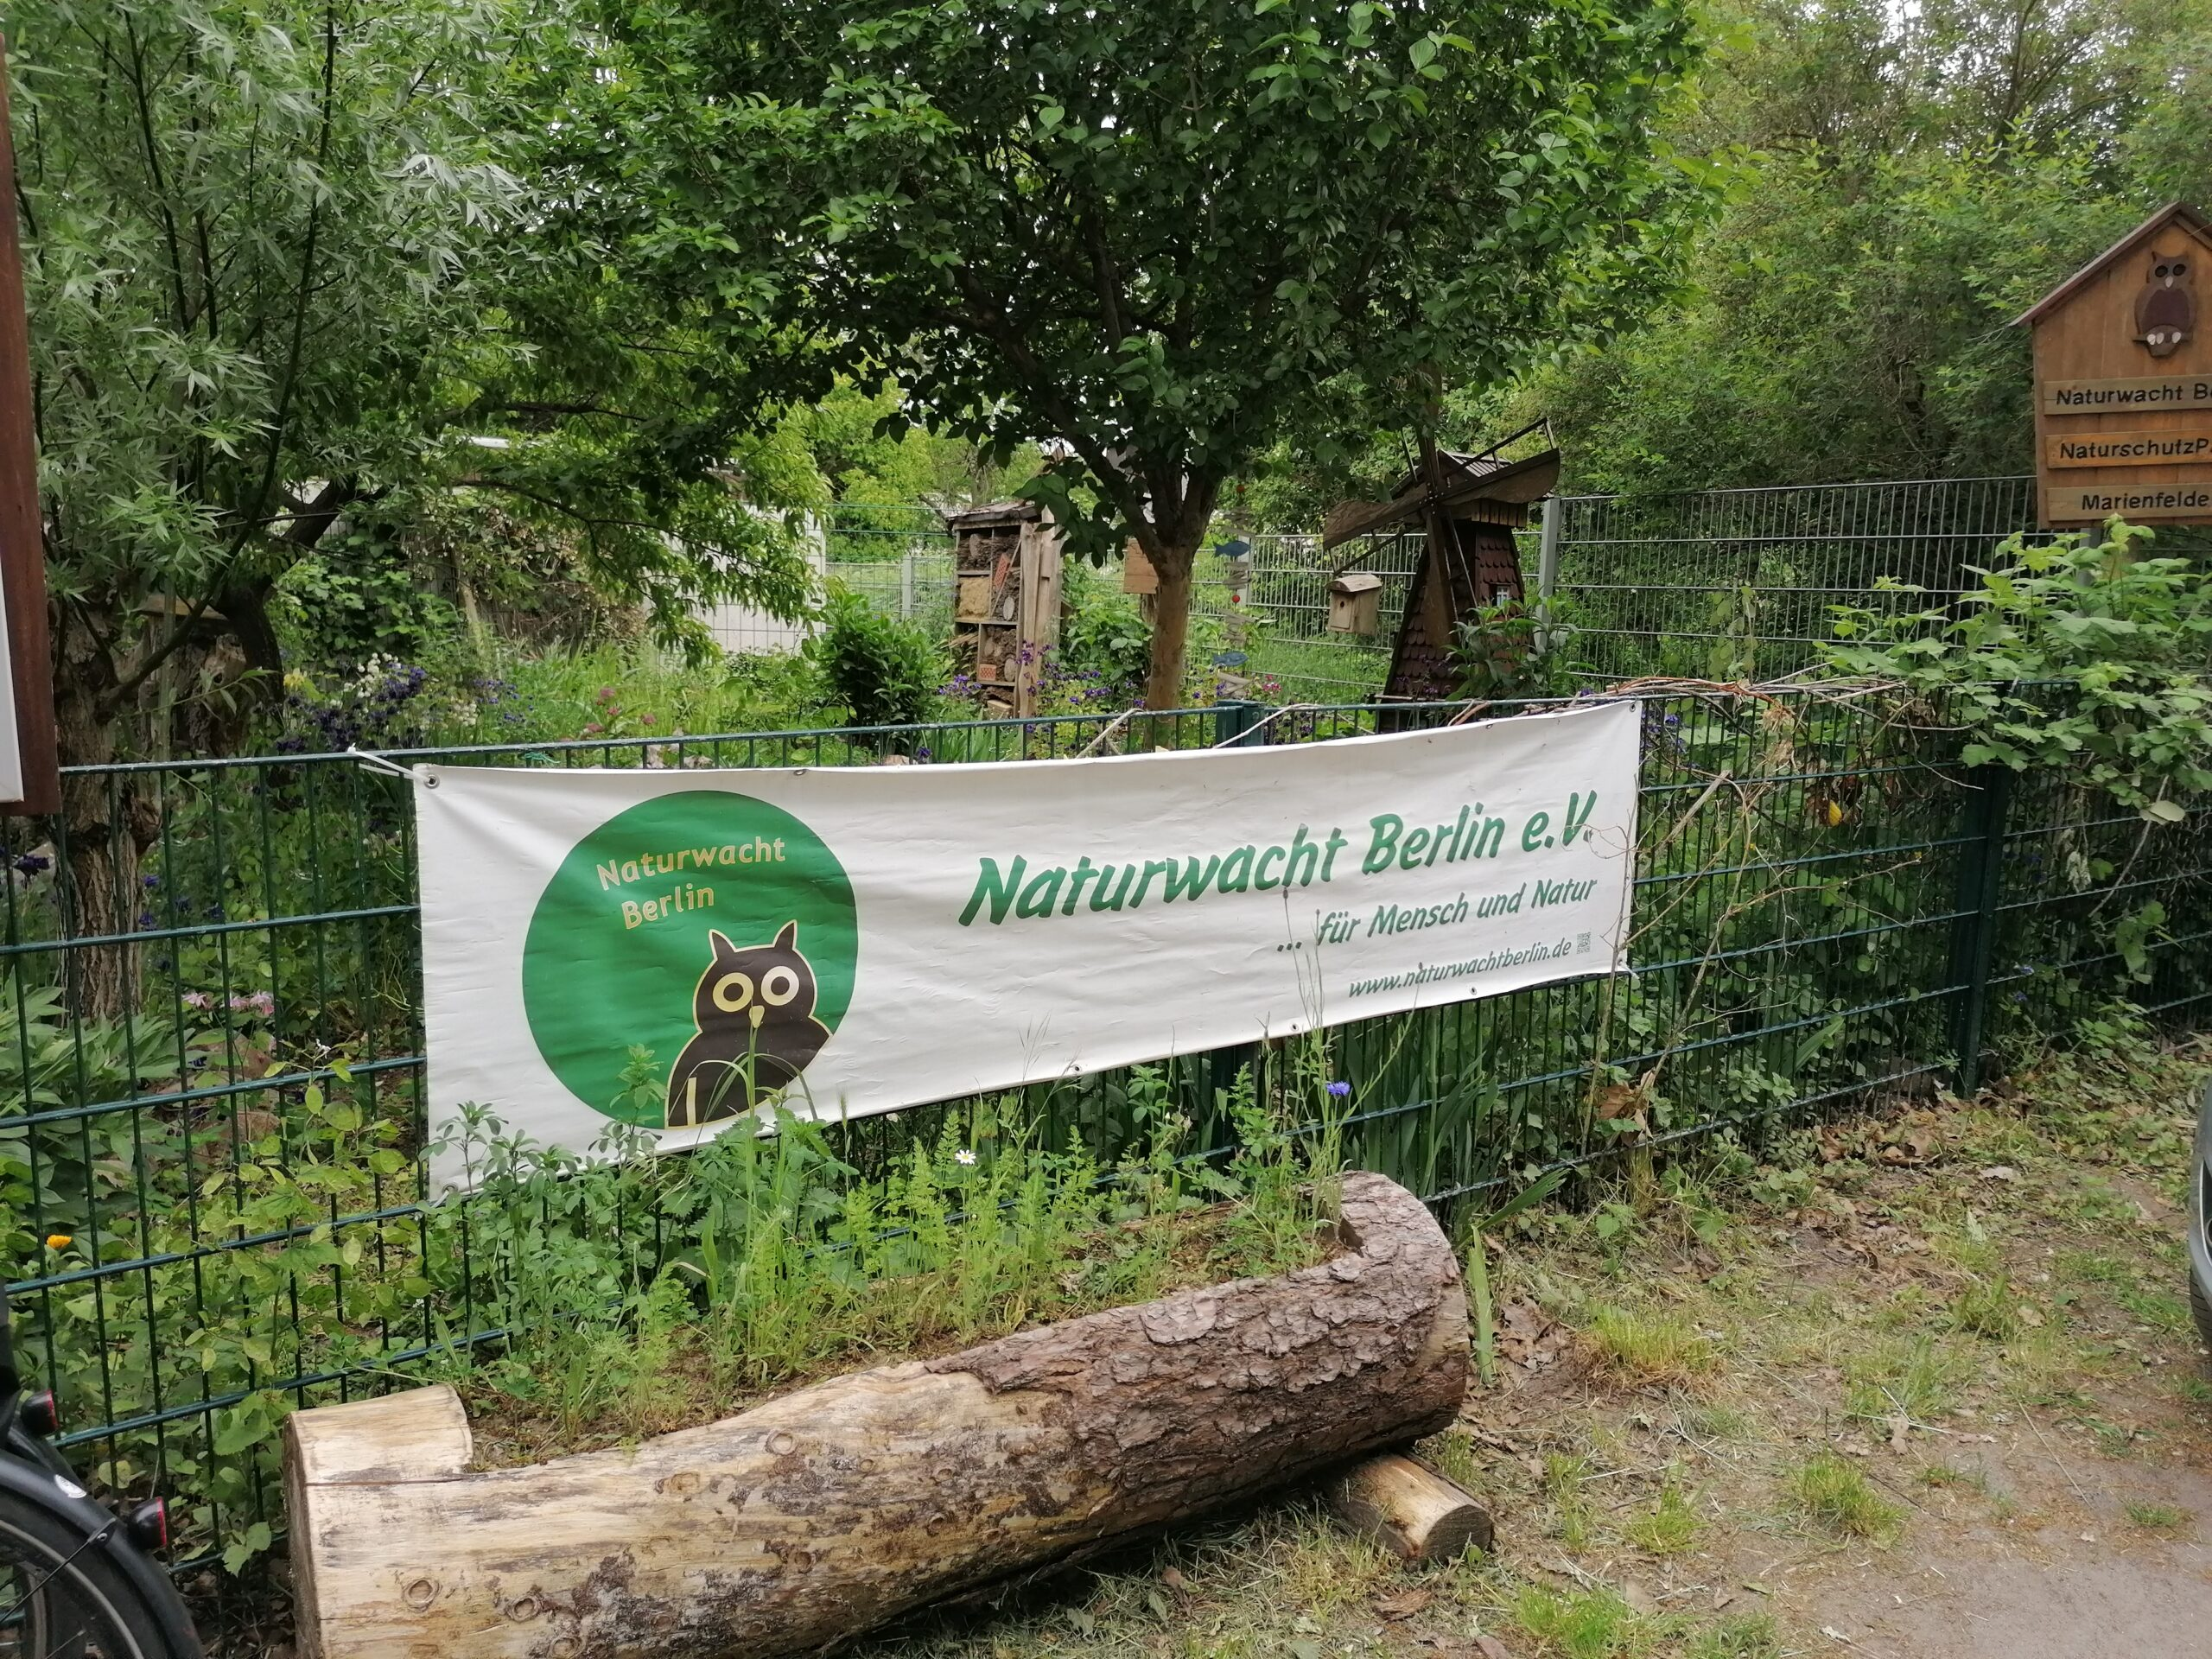 Naturwacht Berlin e.V.